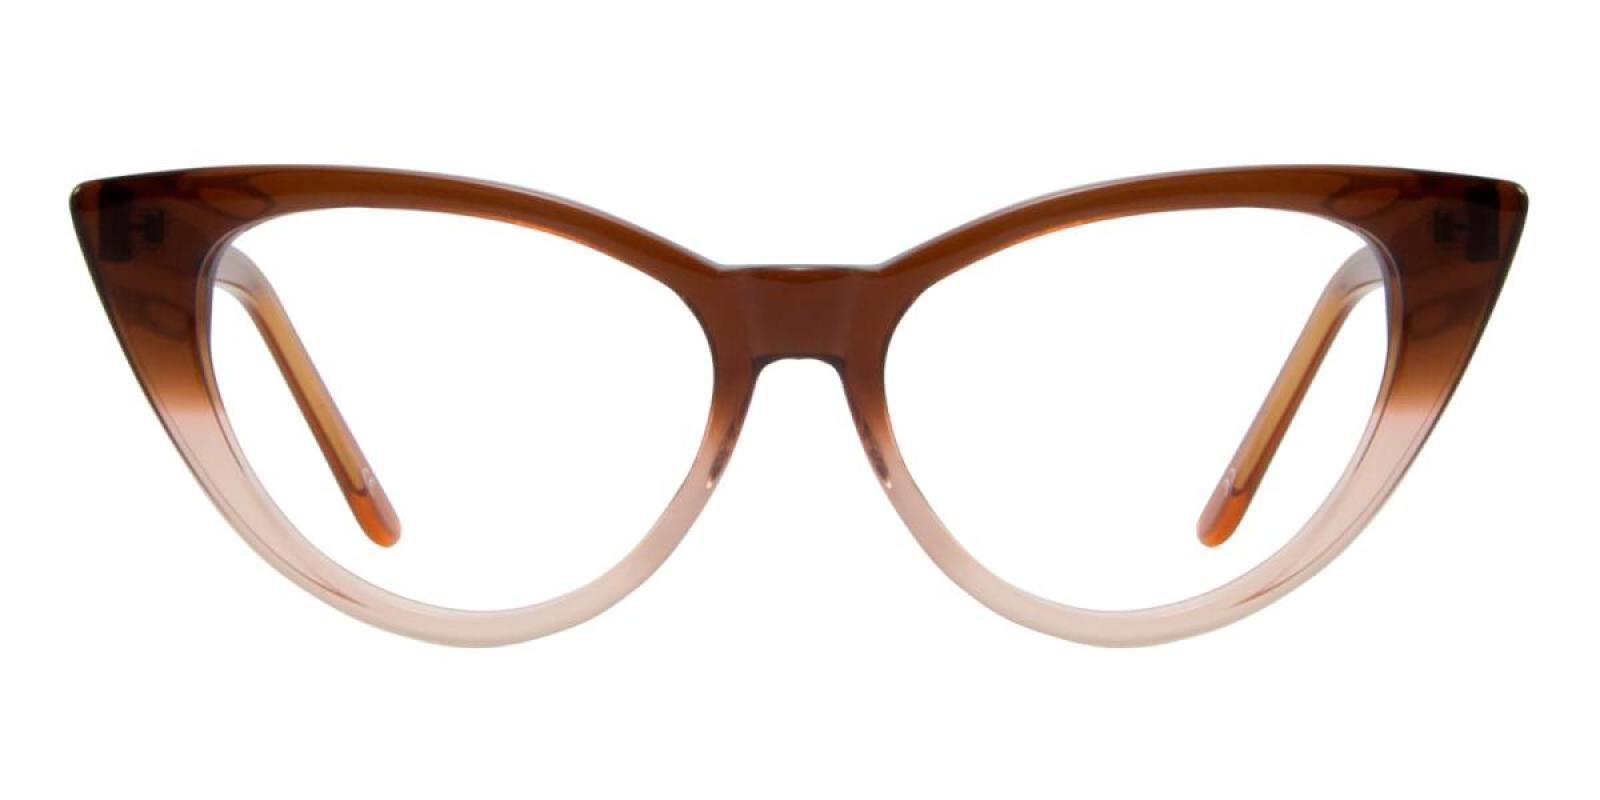 Charm-Brown-Cat-Acetate-Eyeglasses-additional2